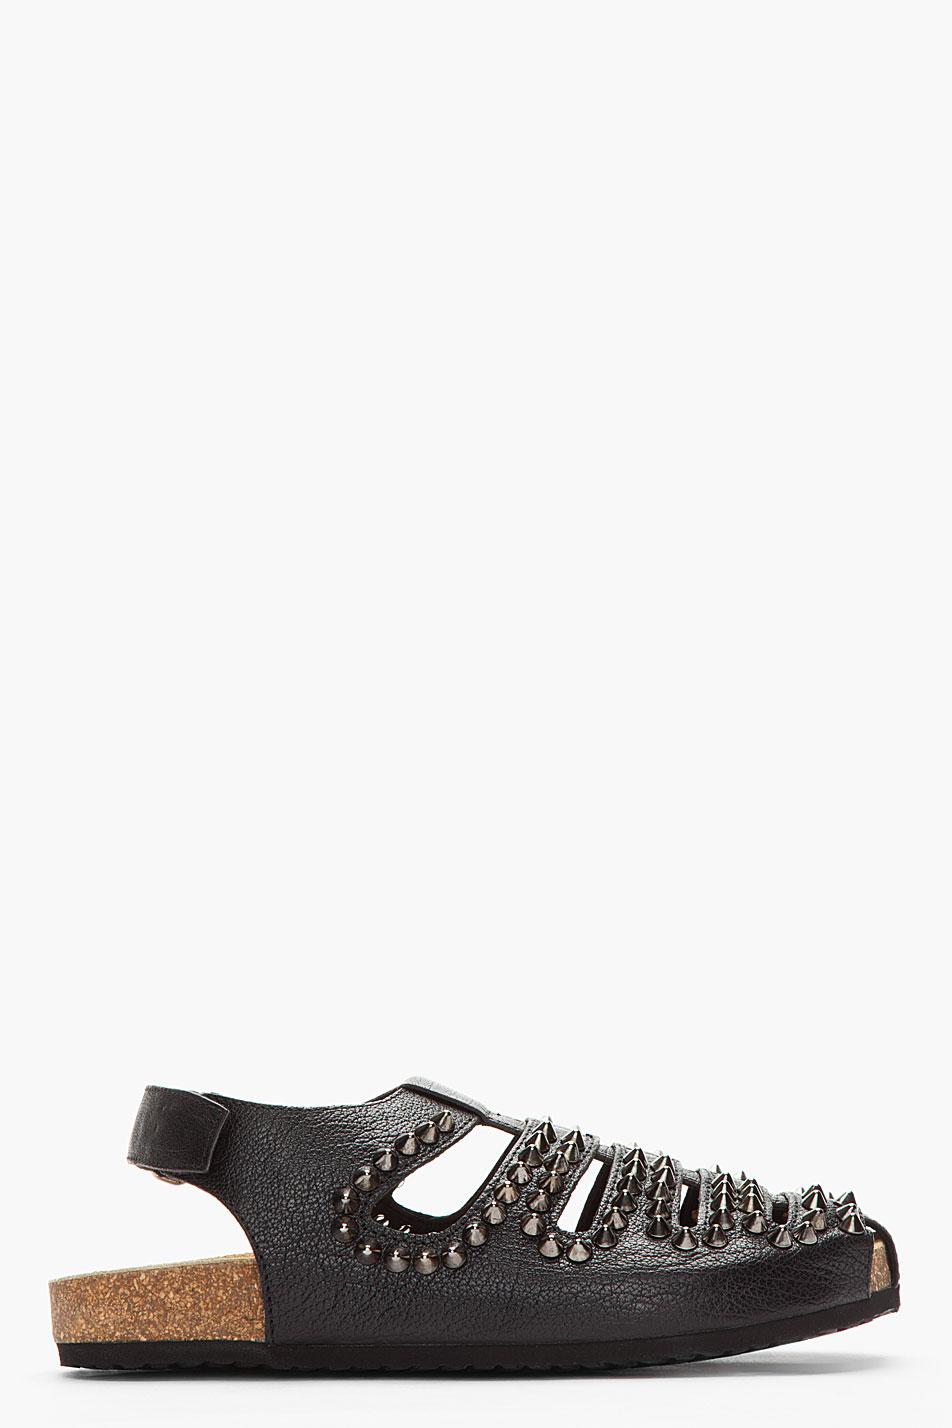 Neil Barrett Black Bufflo Leather Studded Norwich Sandals